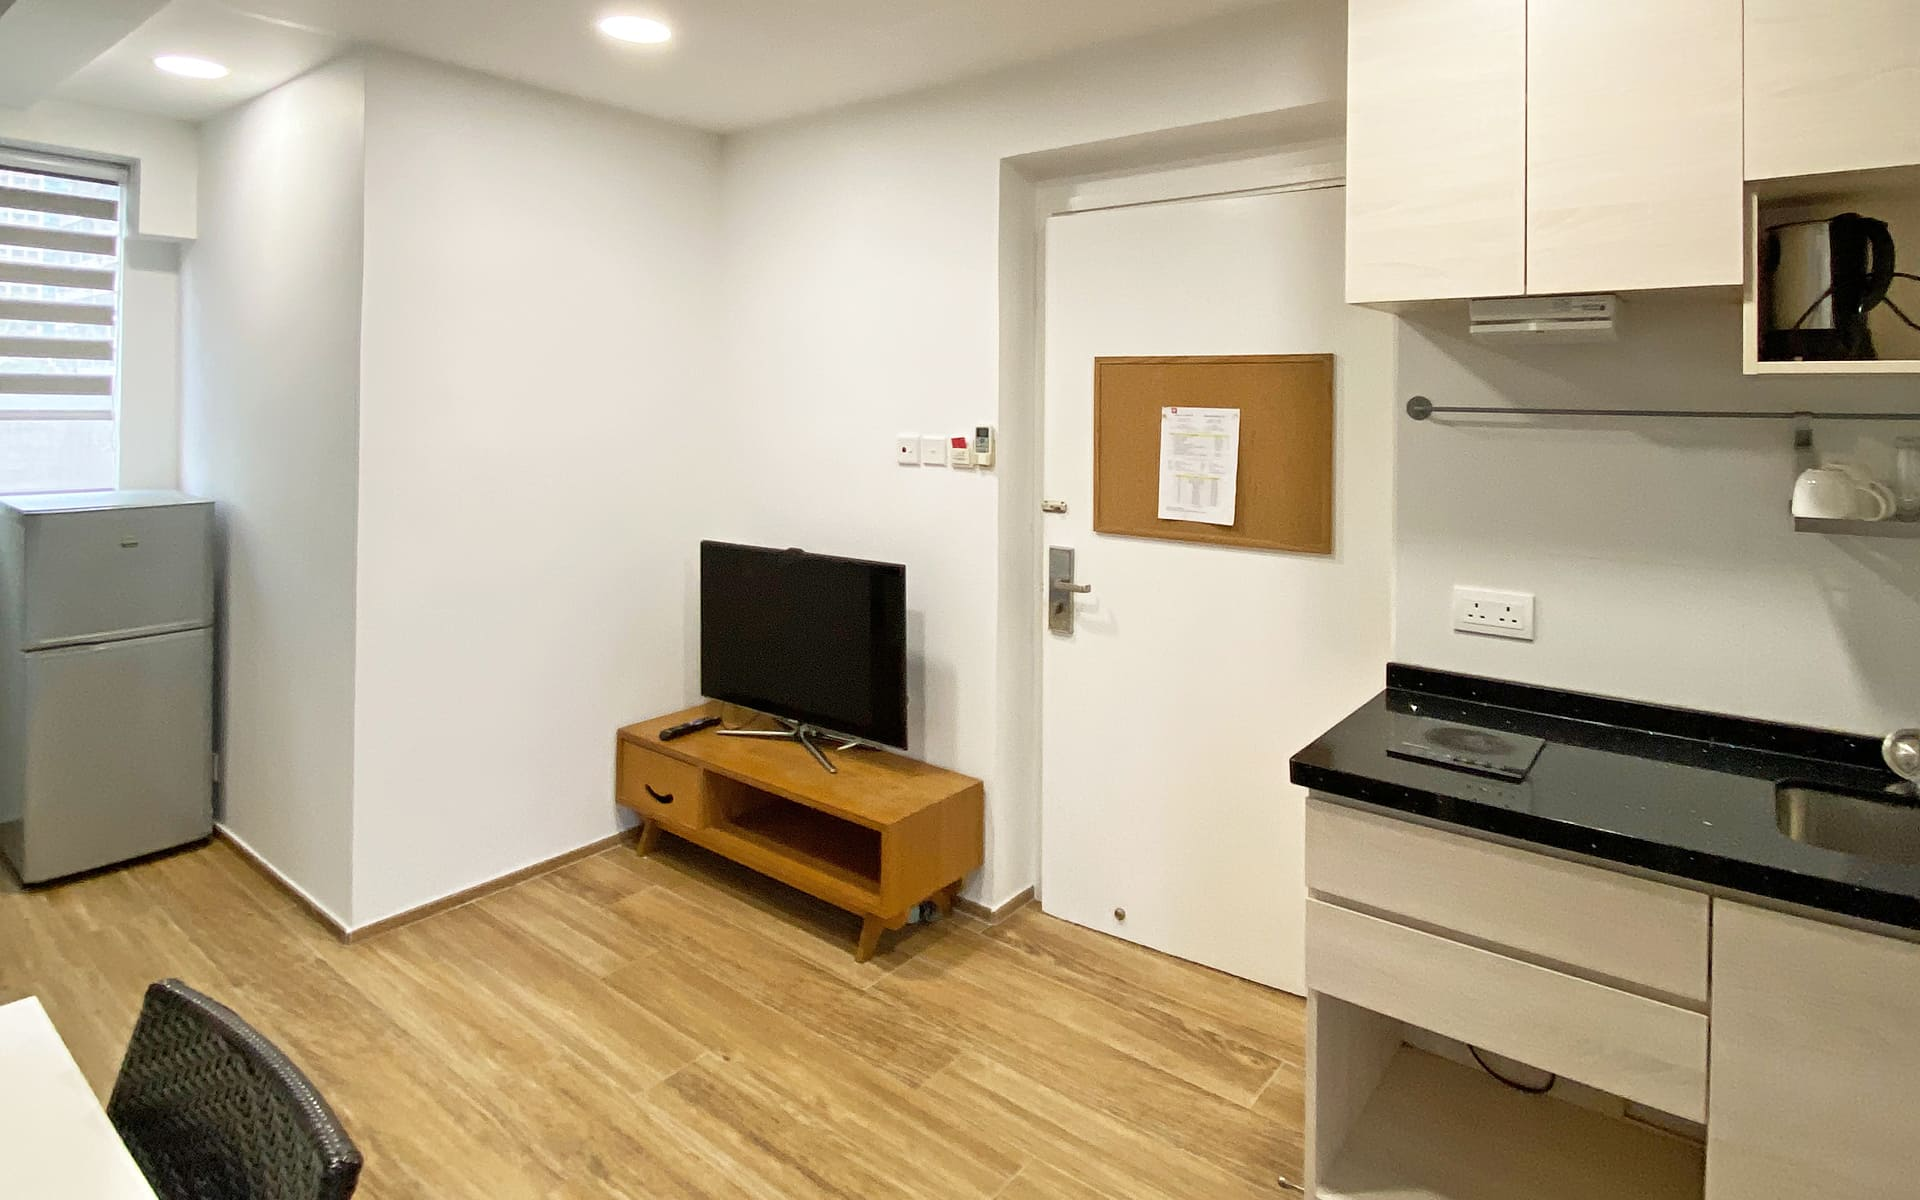 hk_service_apartment_1141124101593399938.jpg